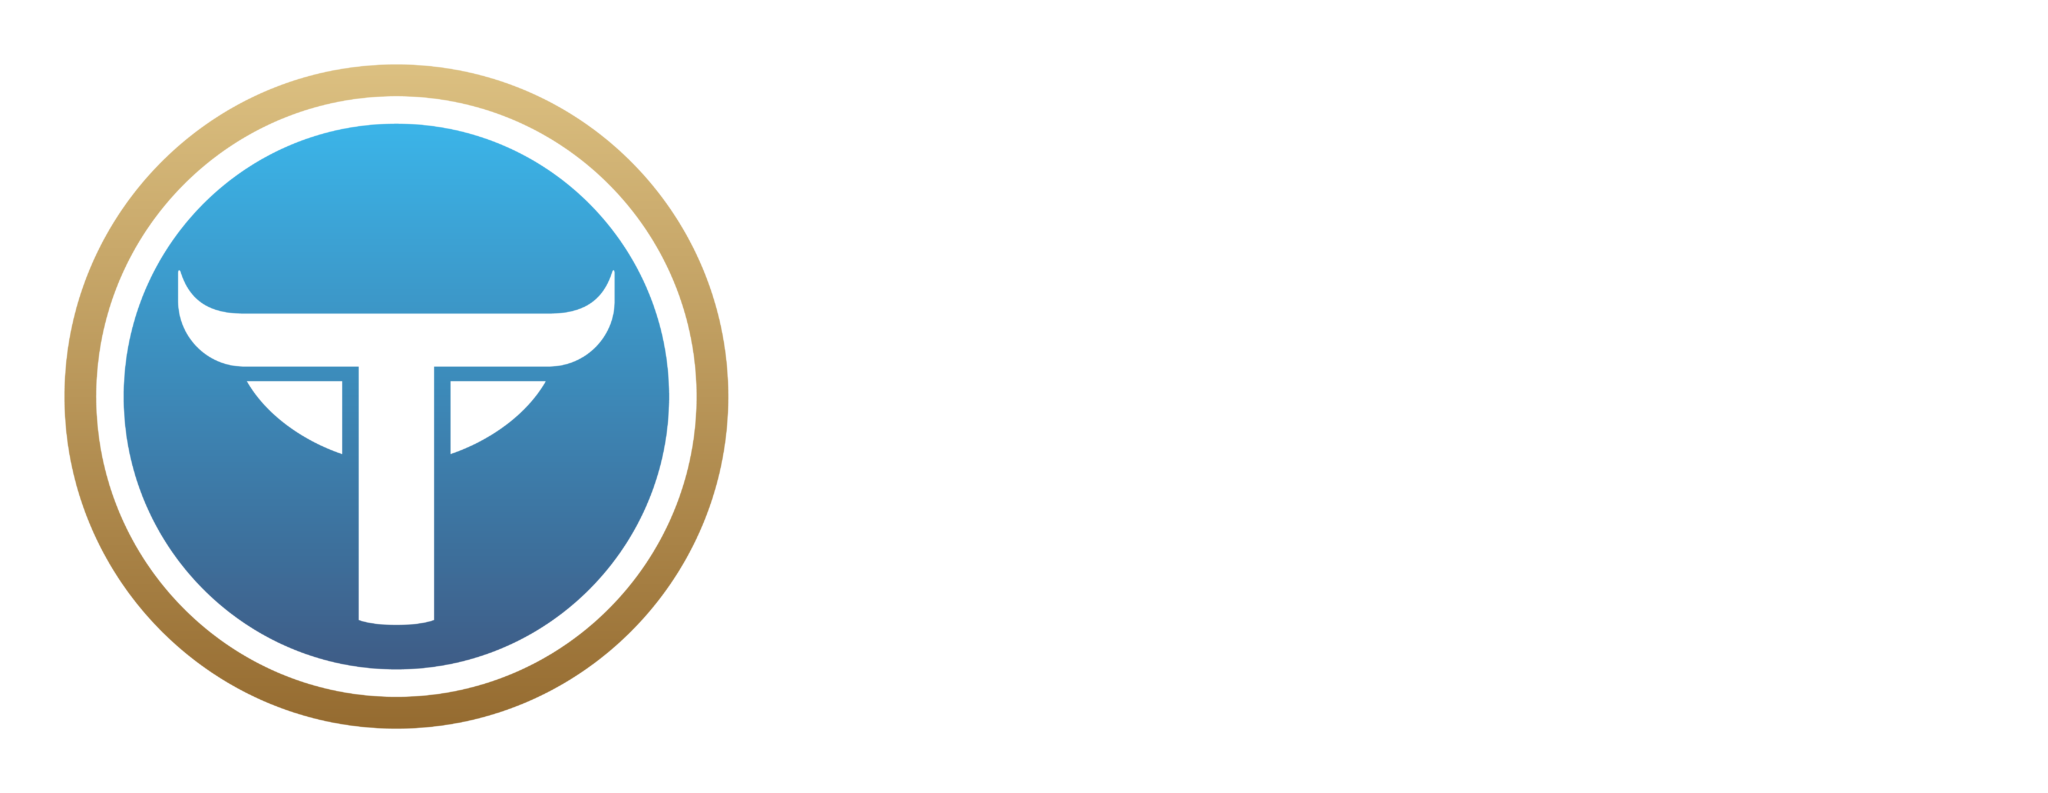 Taurus Marketing logos 46